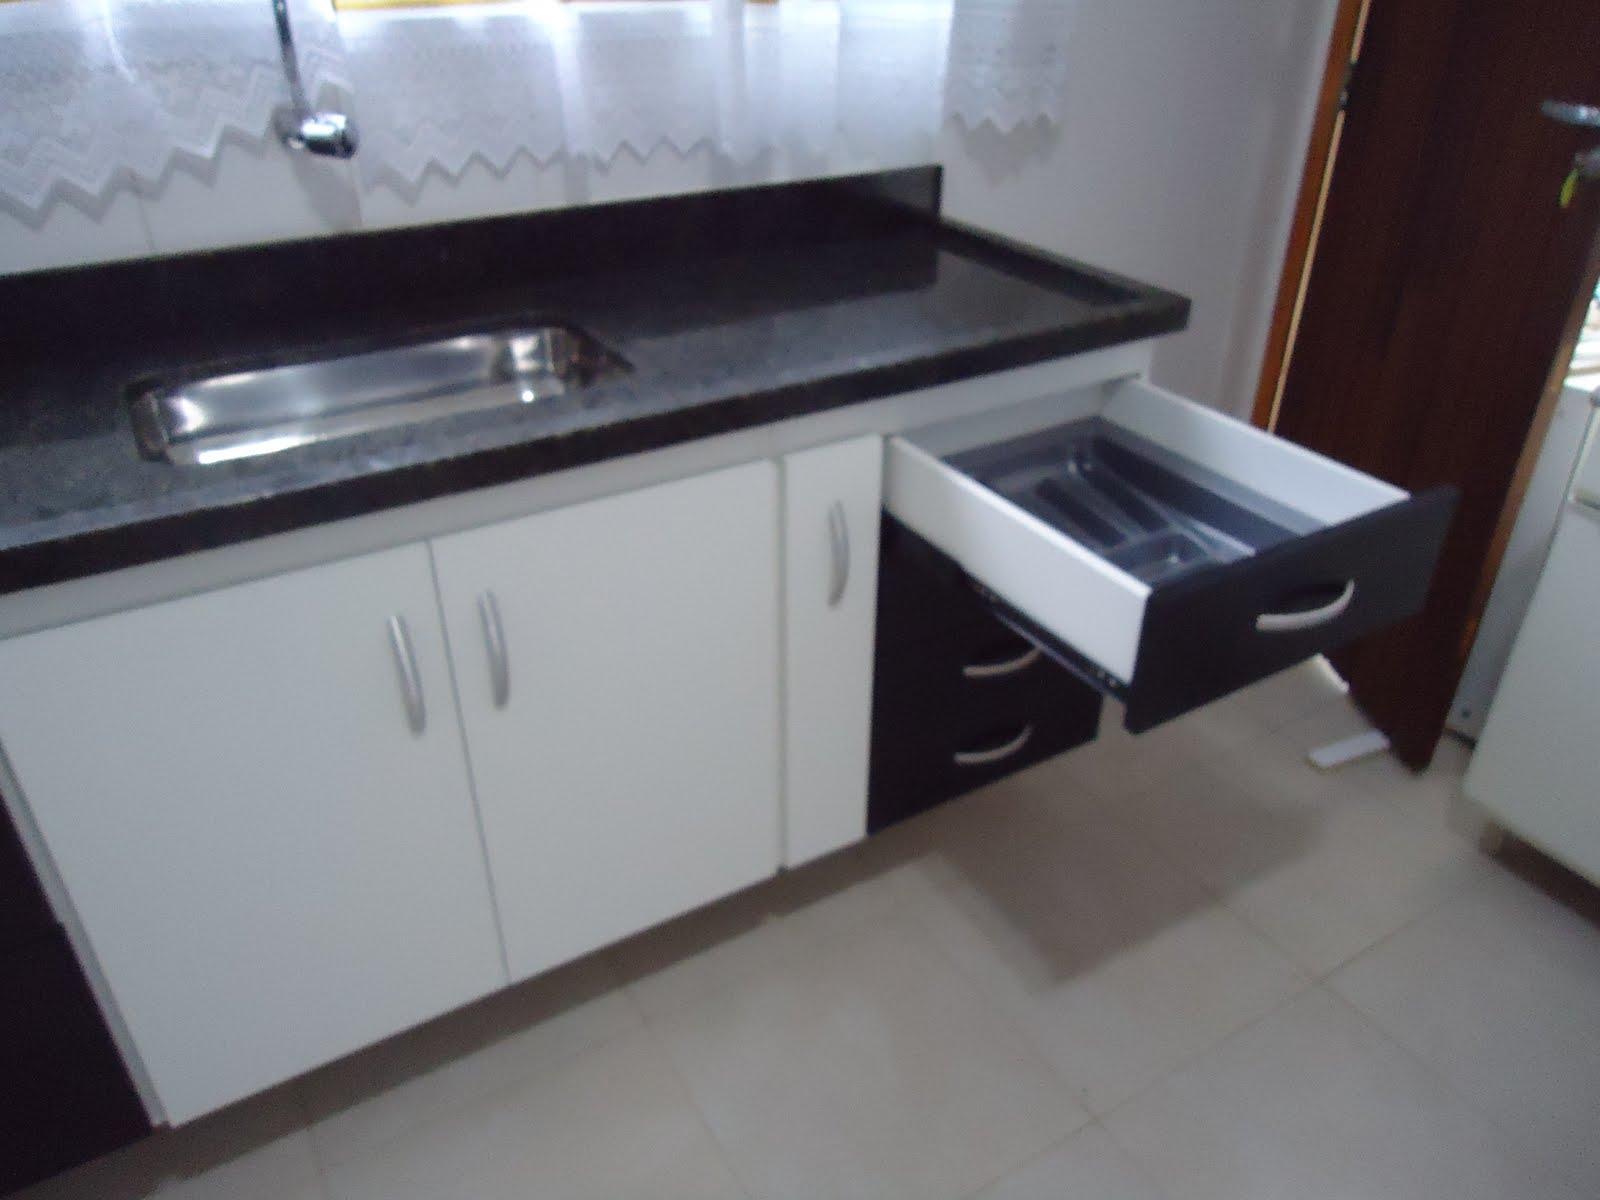 MÓVEIS SOB MEDIDA: DETALHE DO PORTA TALHERES PVC PRATA #51627A 1600 1200